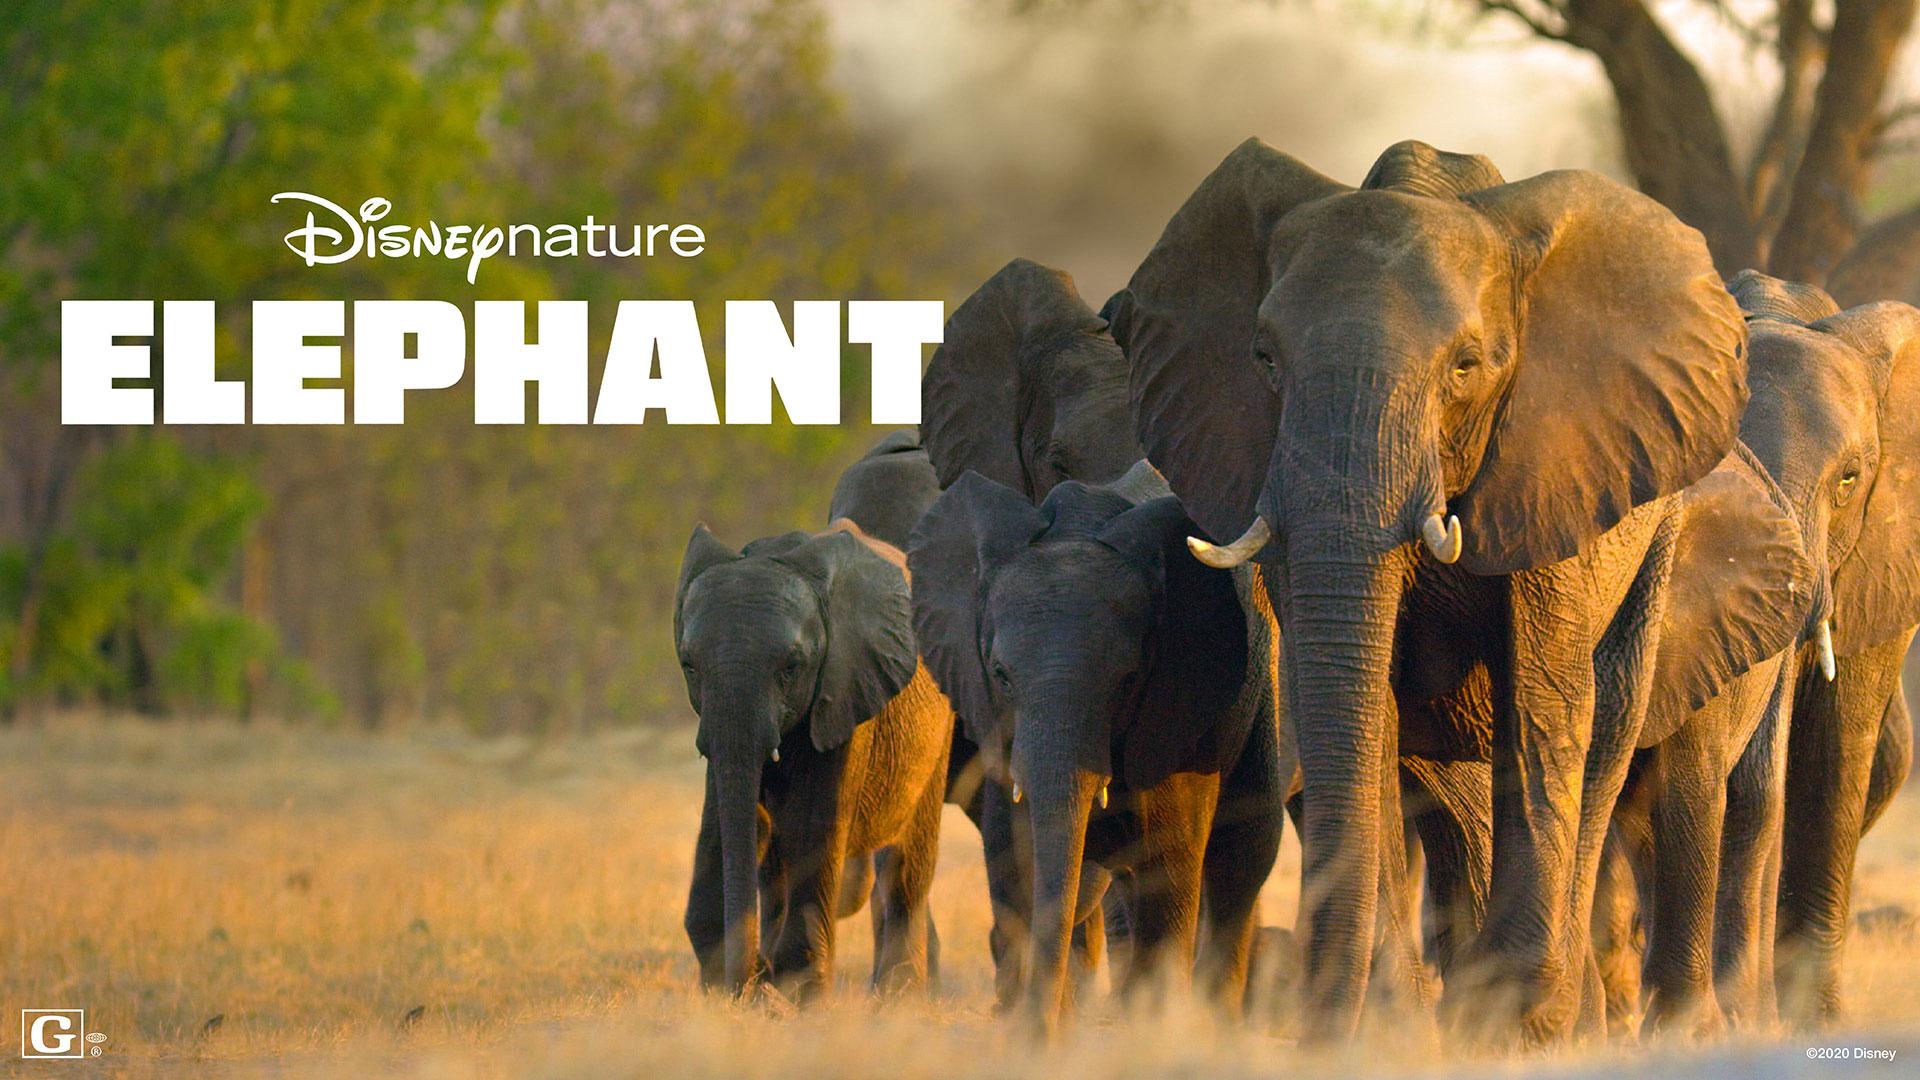 Meghan Markle Disney Elephant GMA